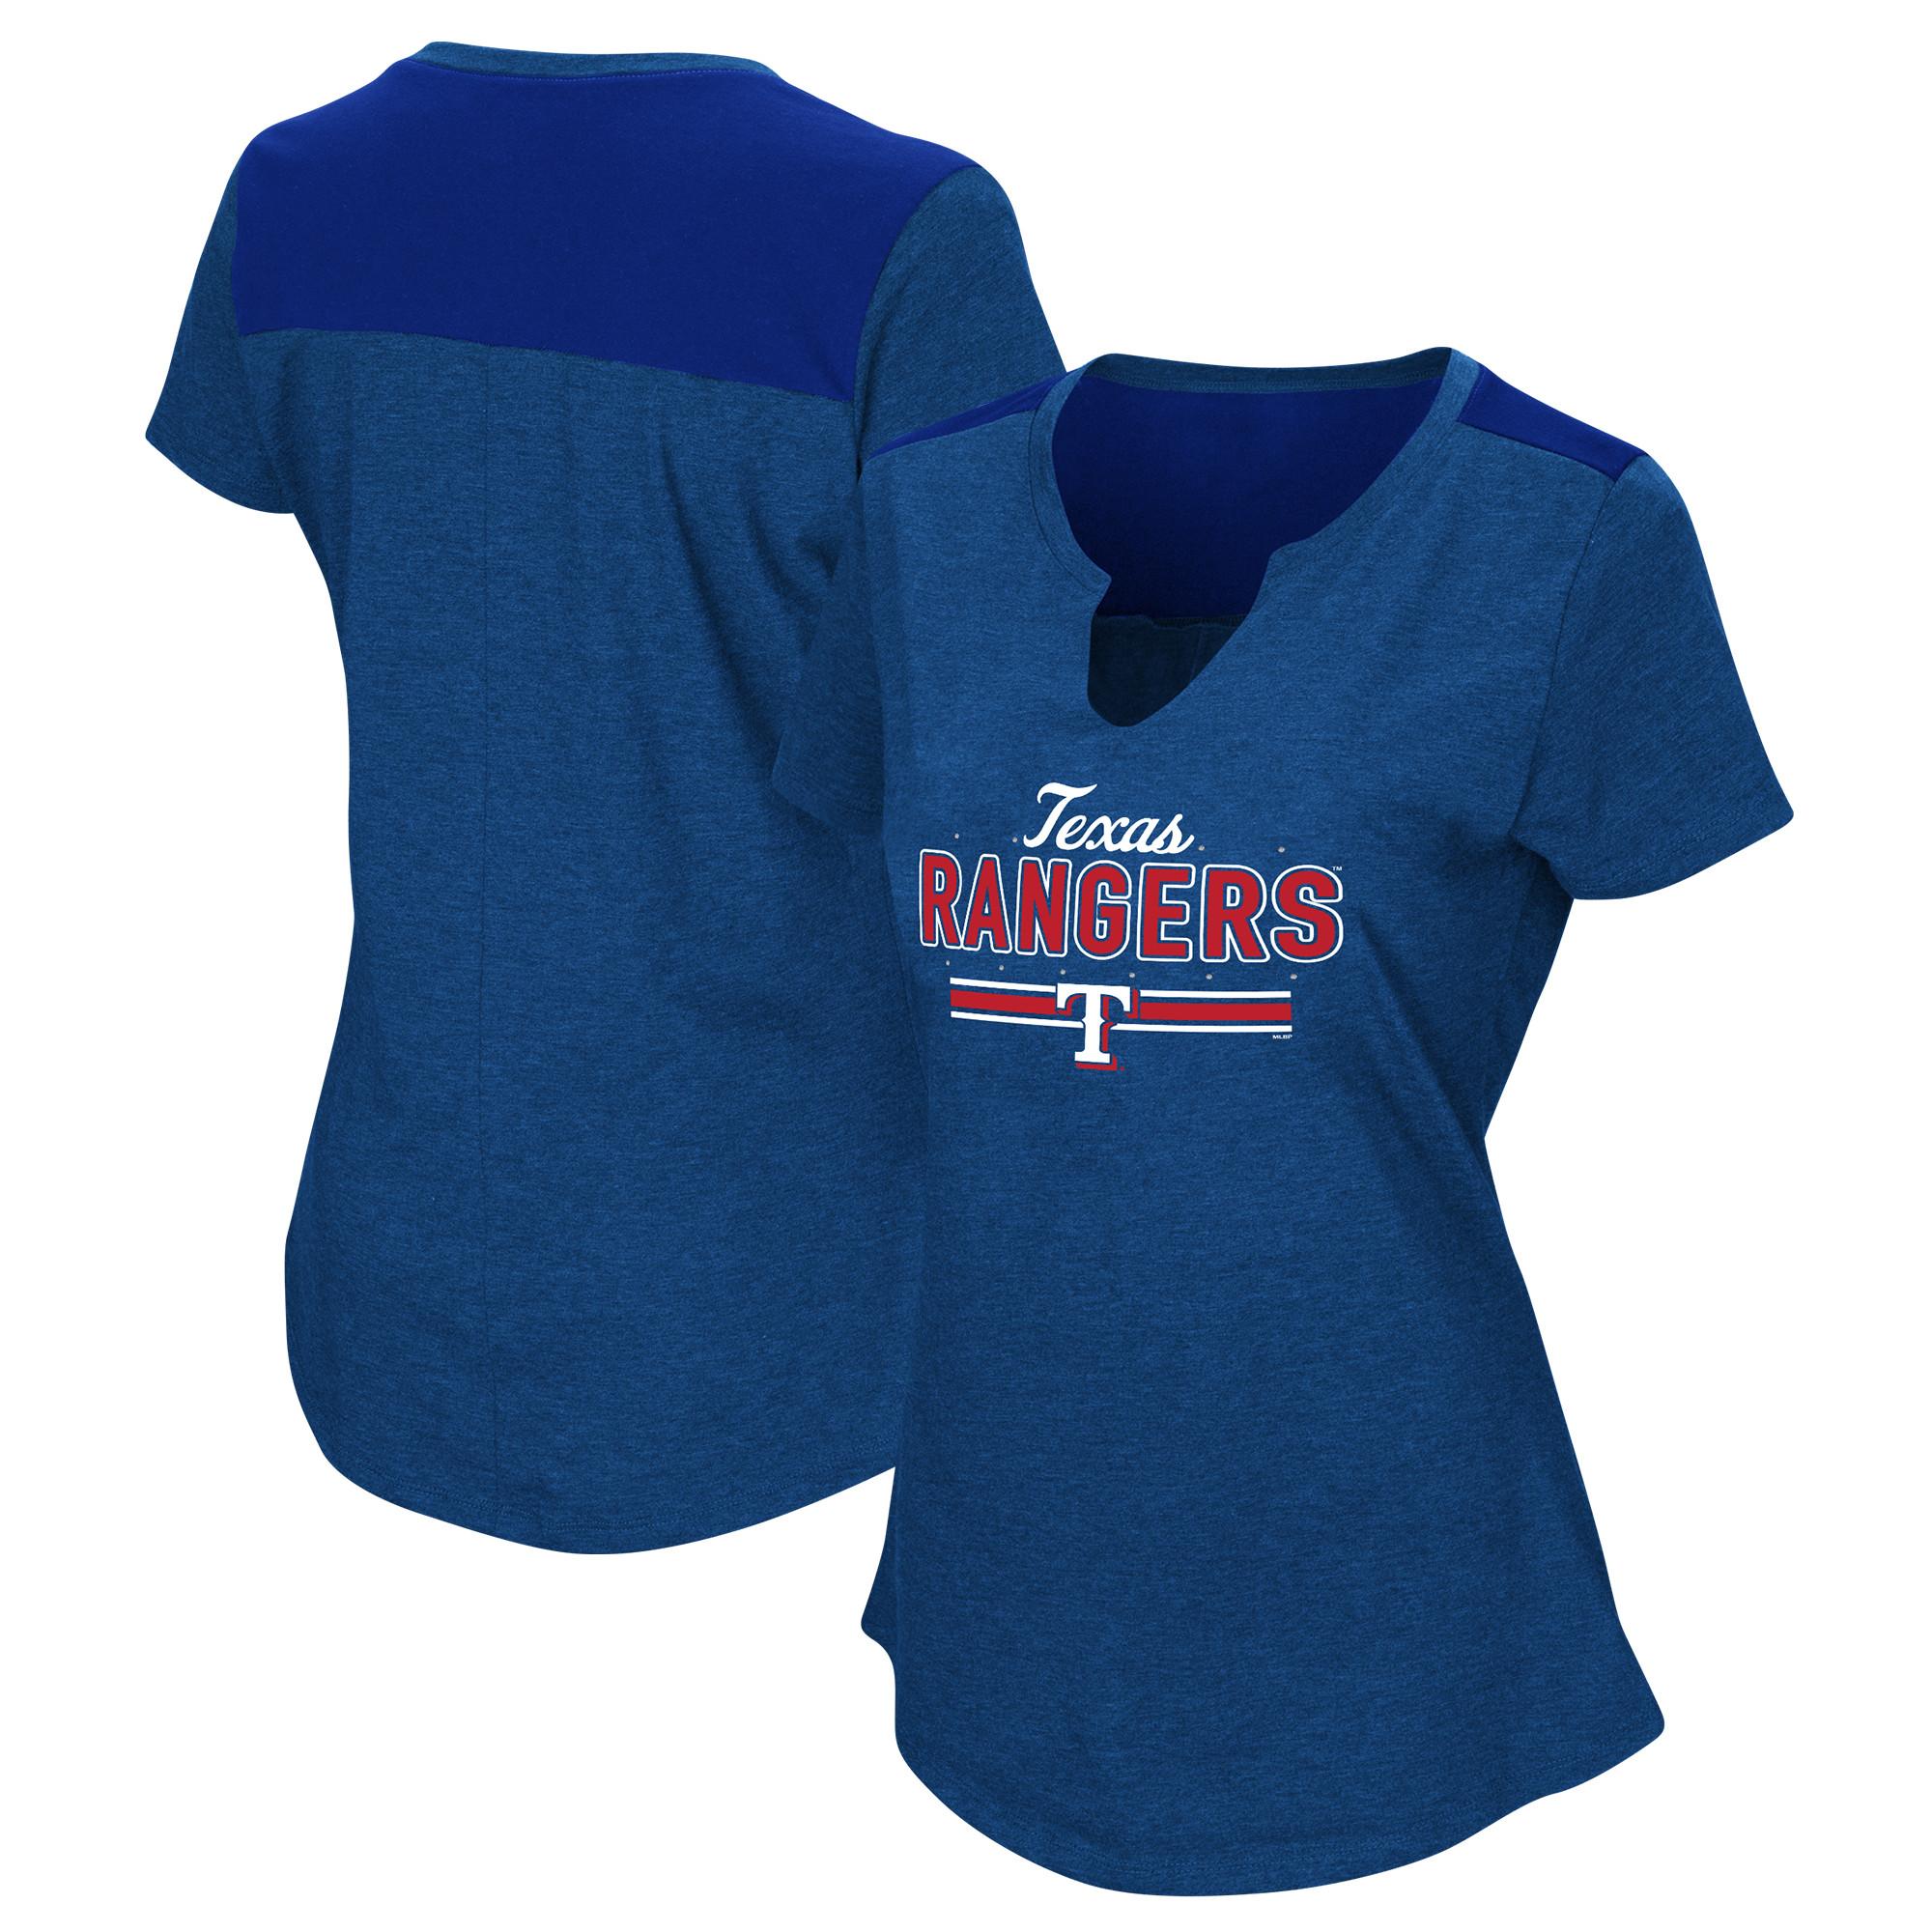 Women's Majestic Royal Texas Rangers Plus Size Switch Hitter T-Shirt